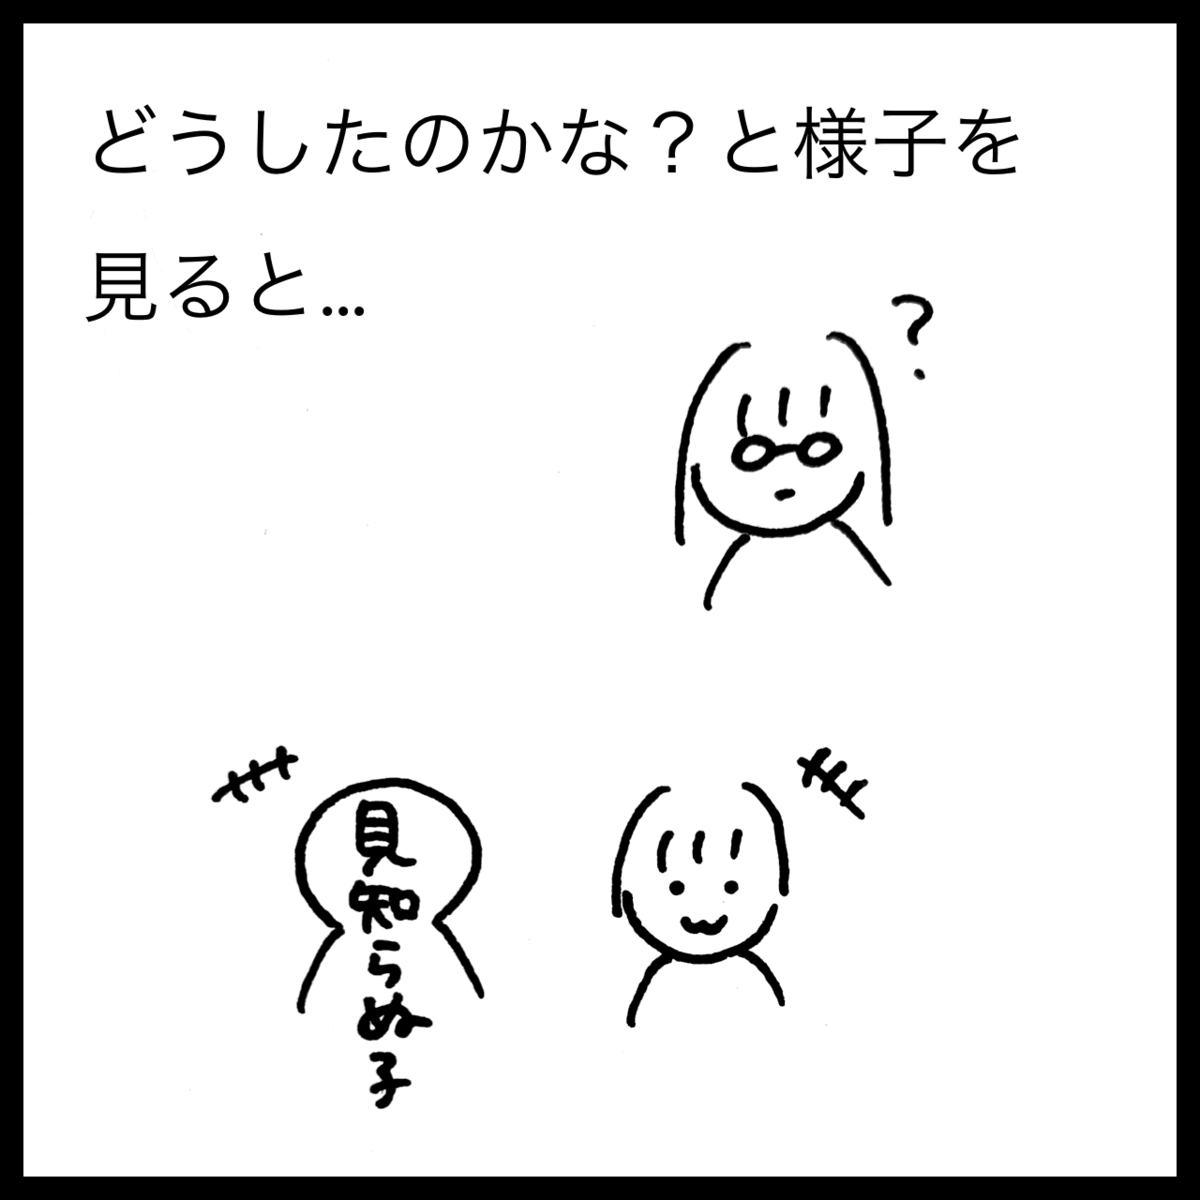 f:id:komyusyomama:20210728214623p:plain